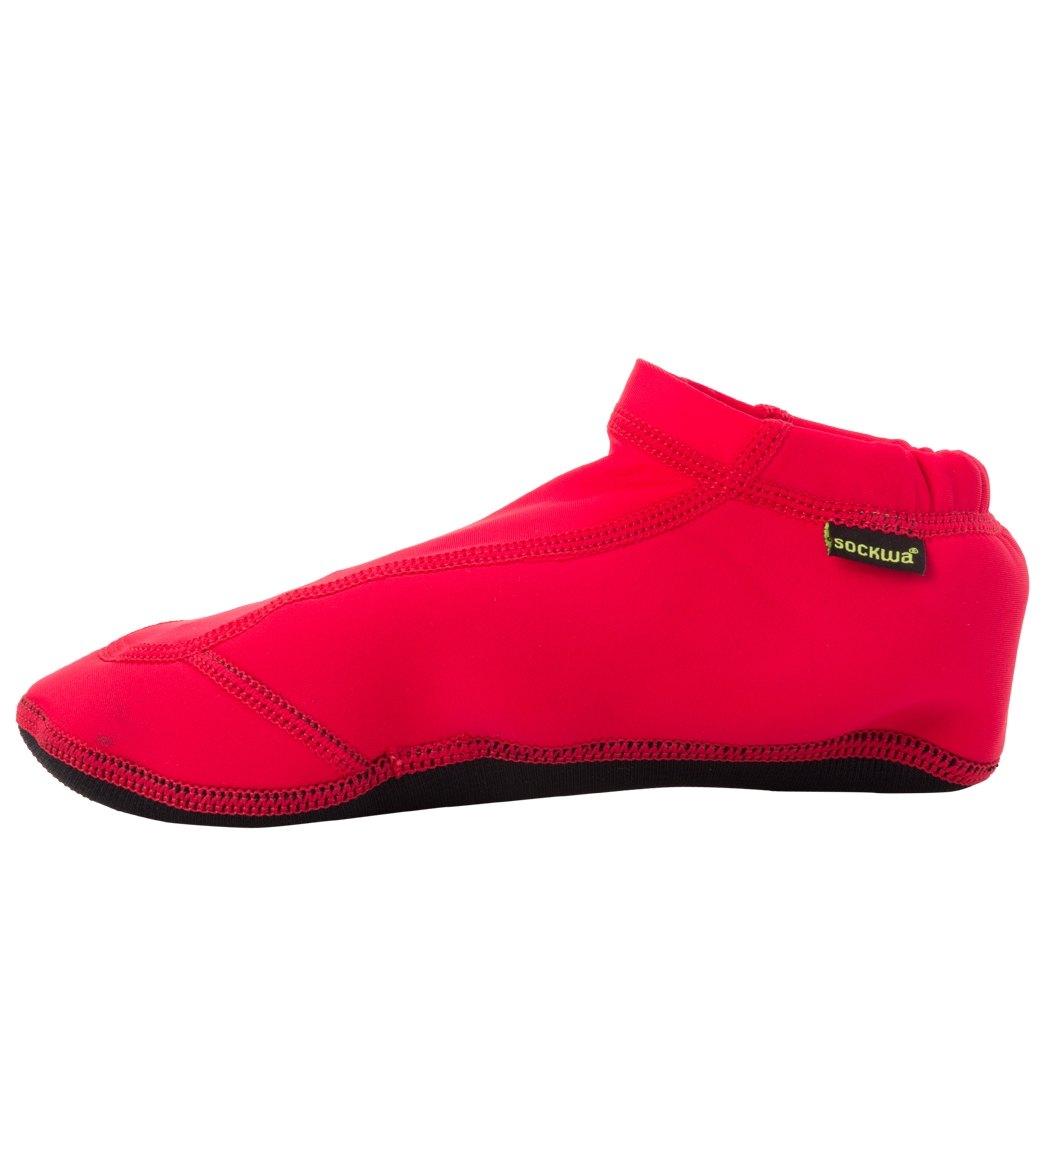 Sockwa Water Shoes Playa Lo Aqua Socks at SwimOutlet.com